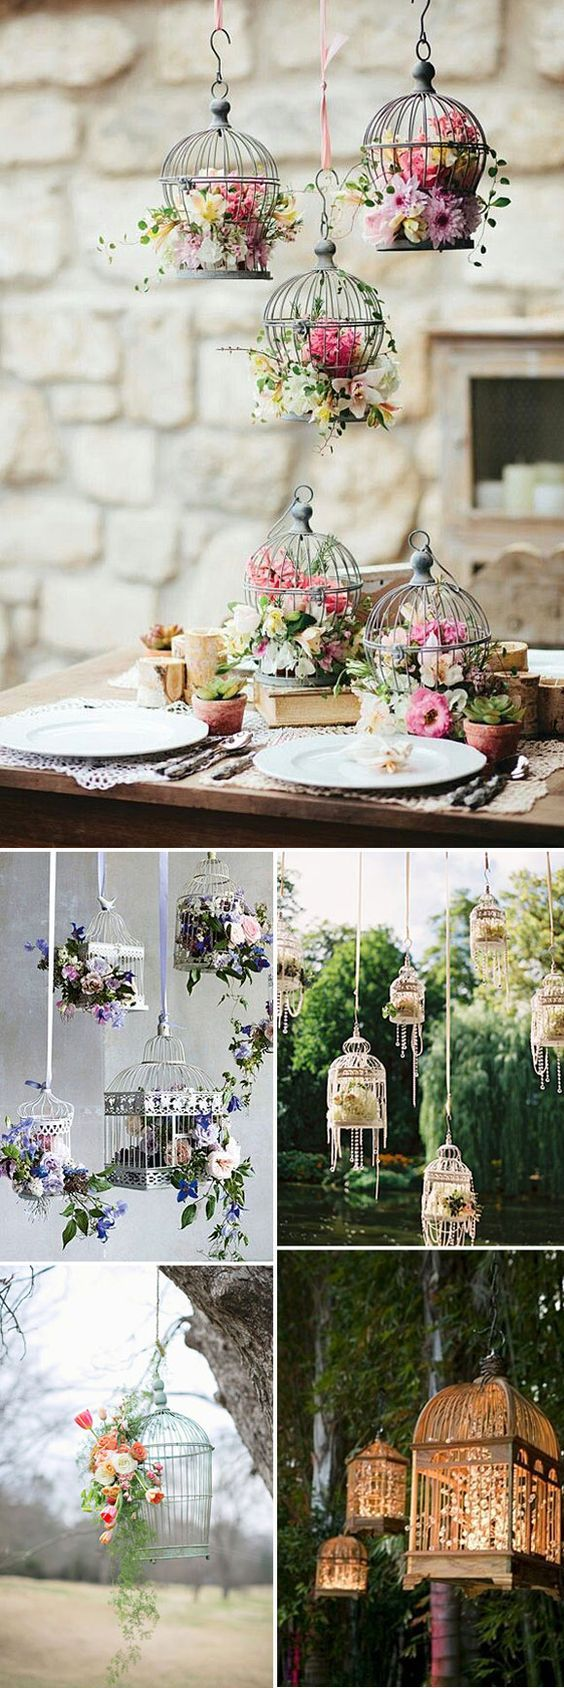 Lavender decor for wedding  best DIY images on Pinterest  Wedding ideas Weddings and Floral